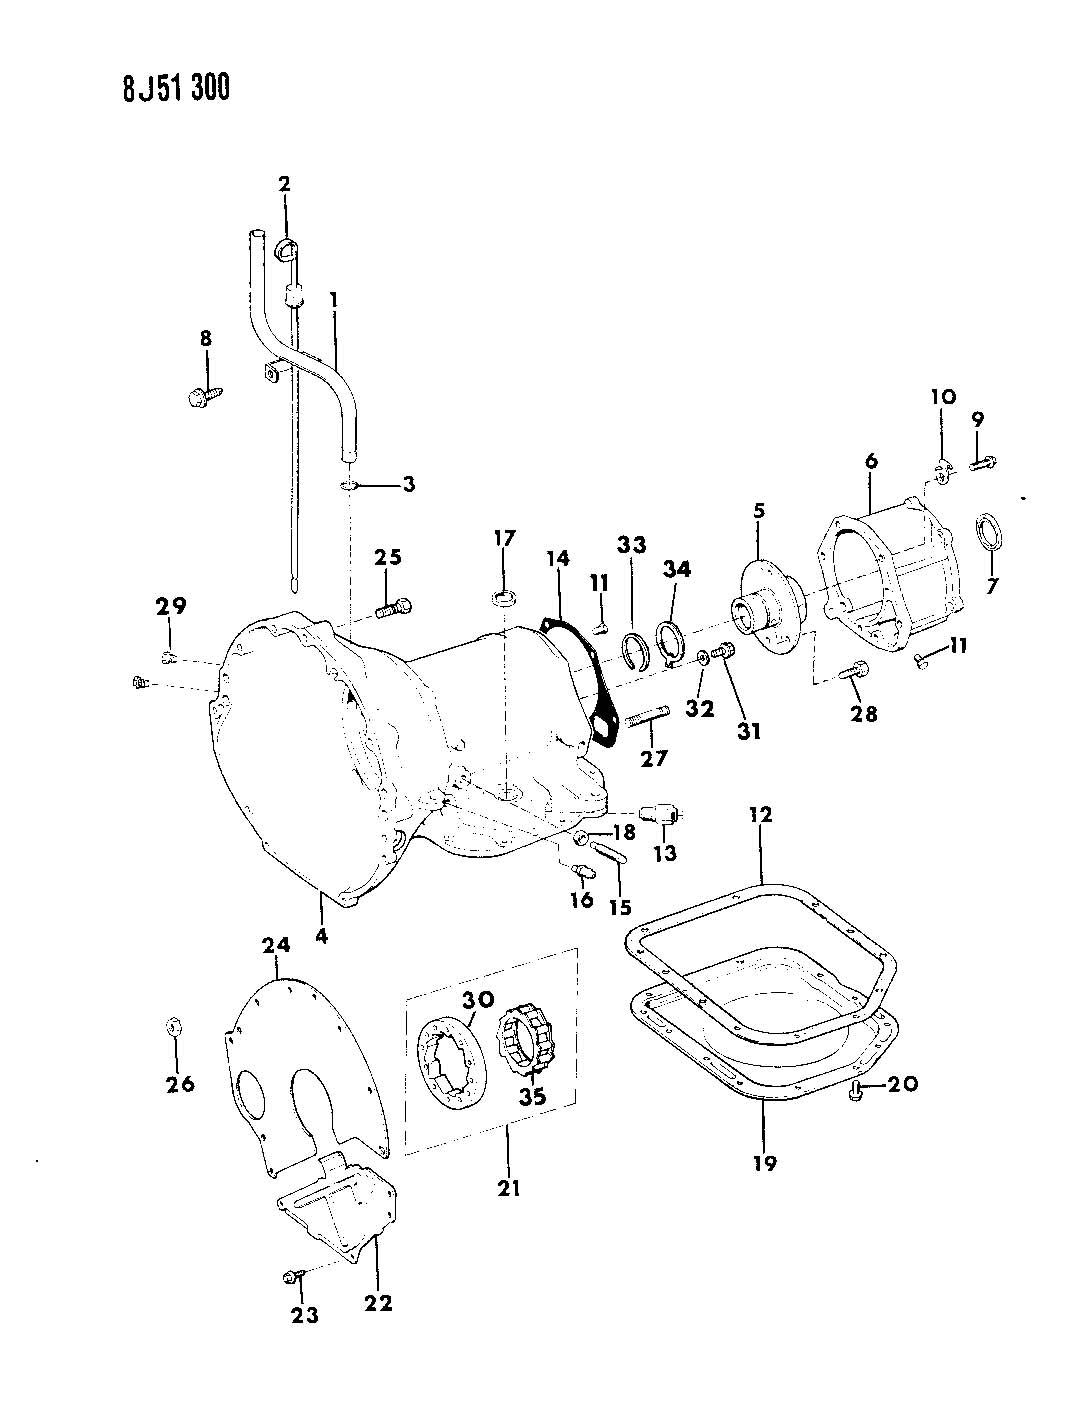 82 jeep cj7 wiring diagram